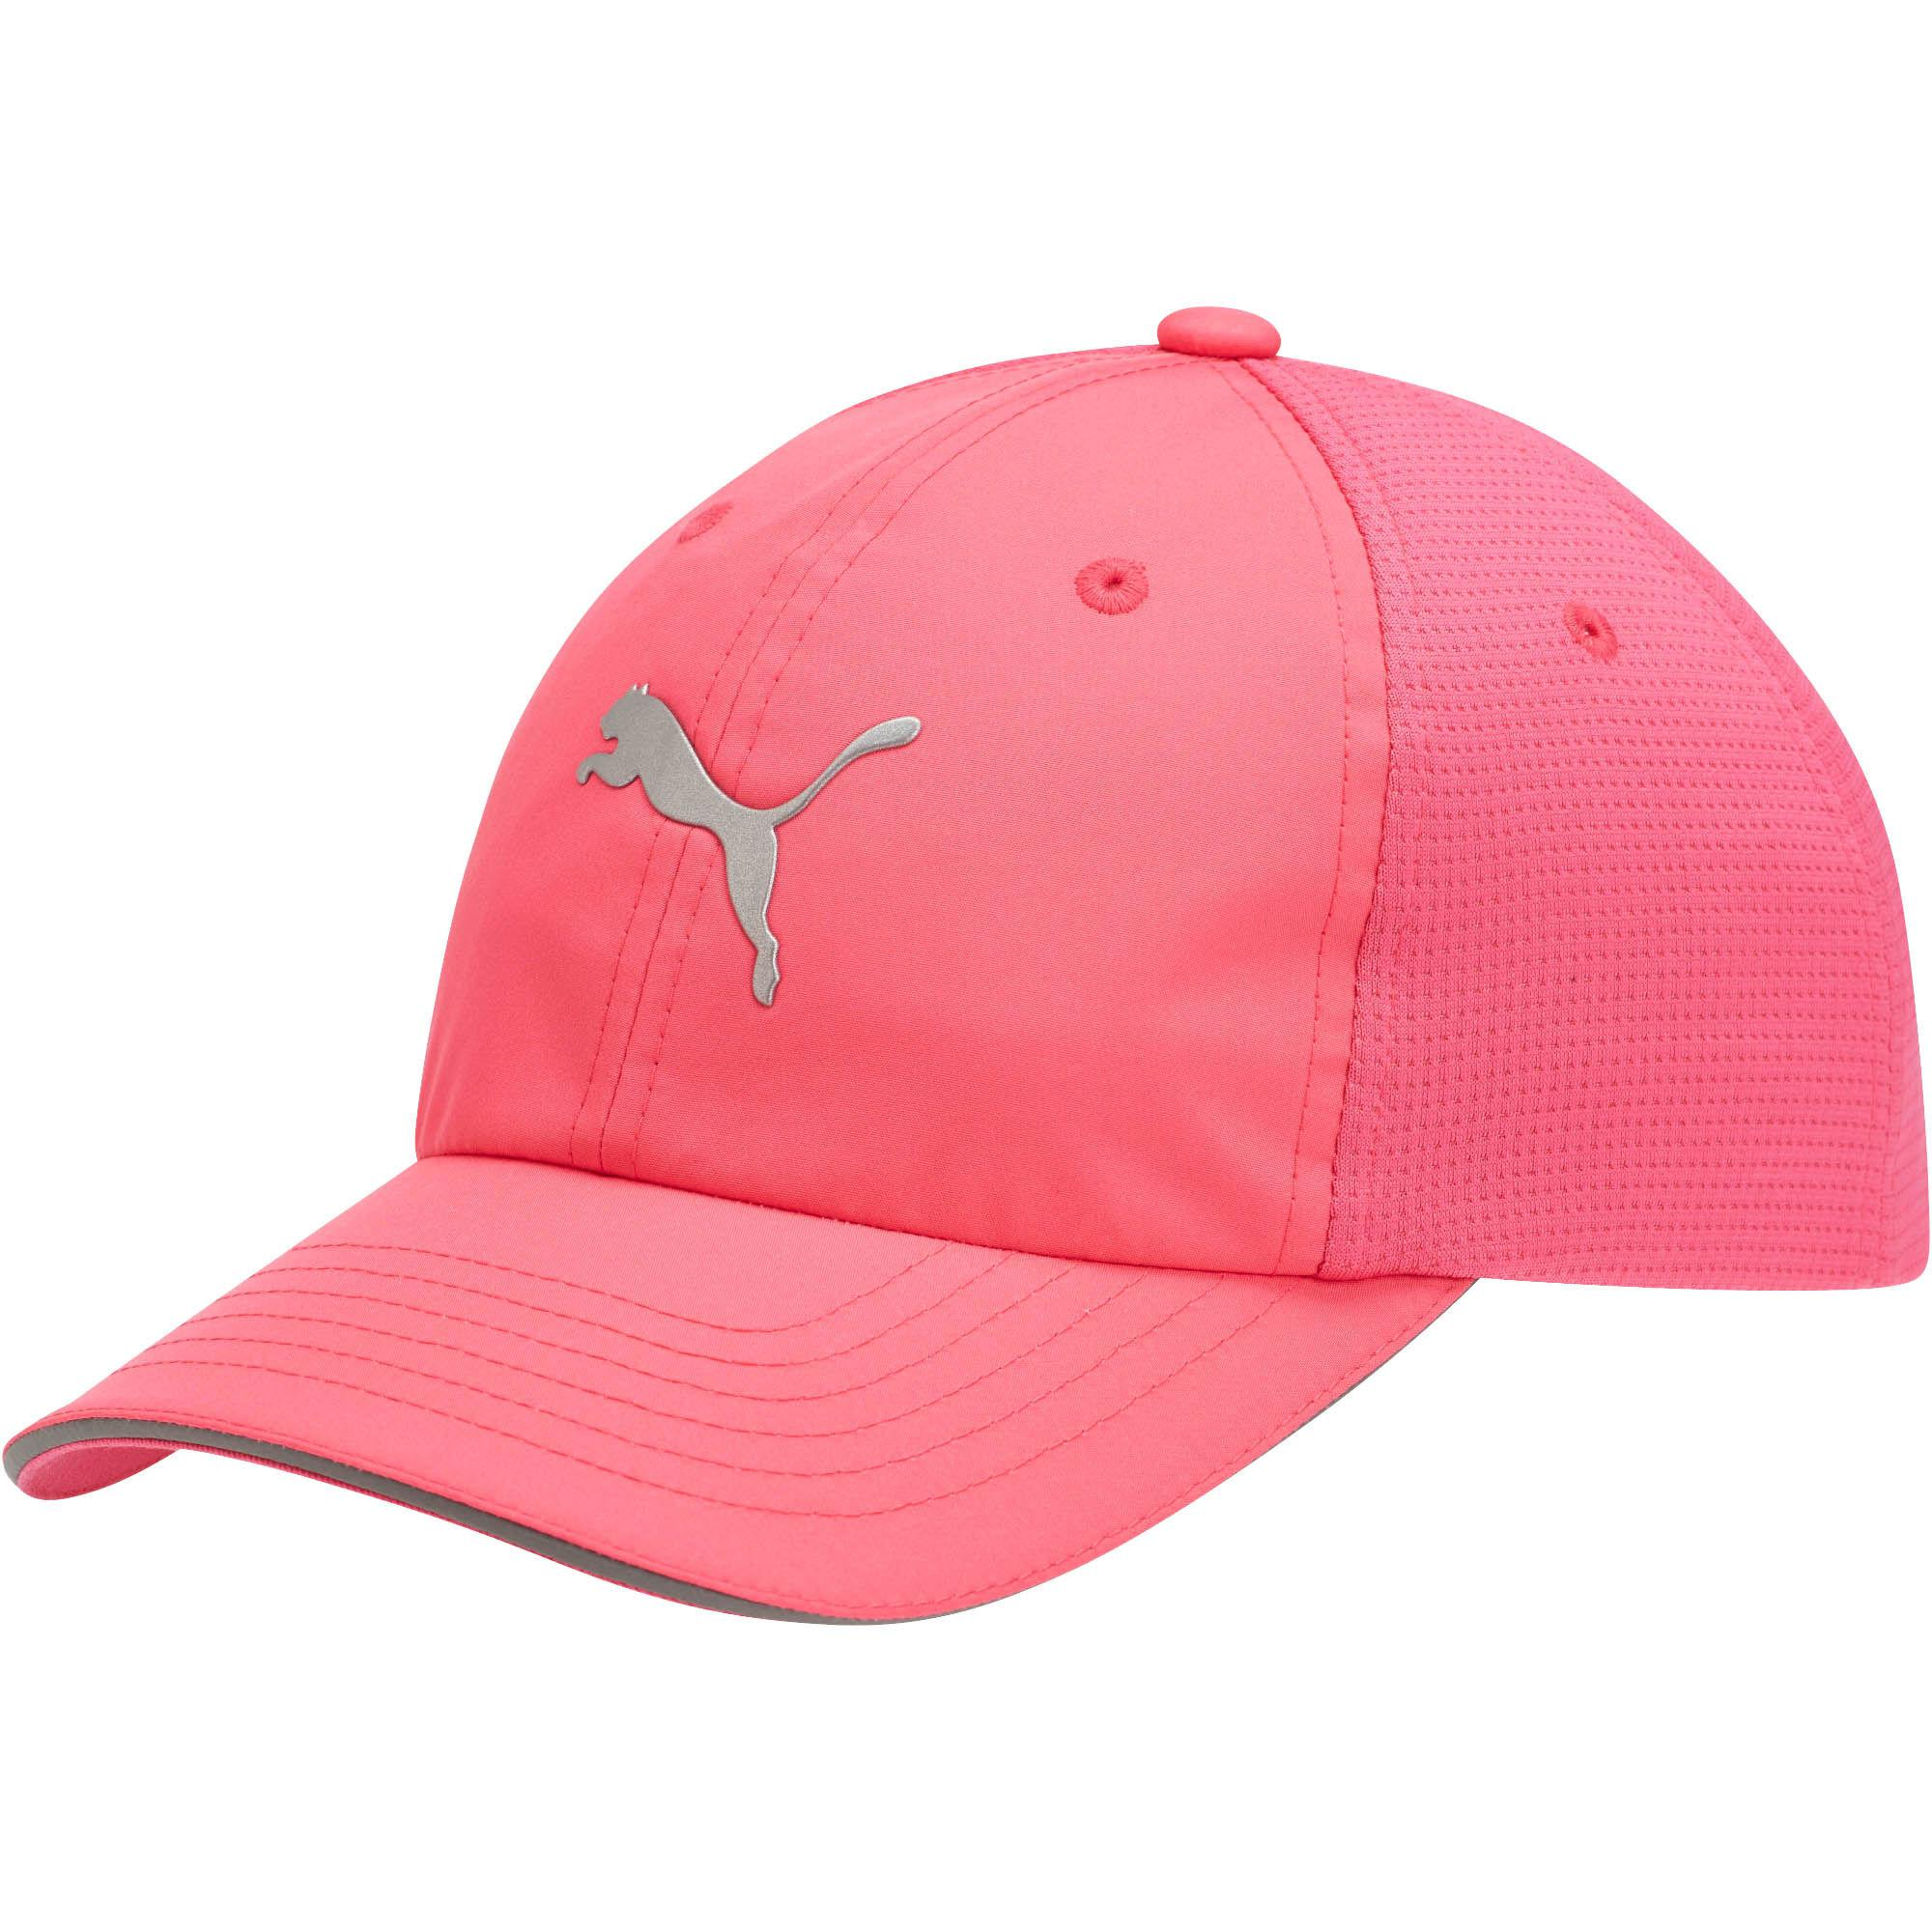 6705b52f PUMA Mesh Running Hat in Pink - Lyst